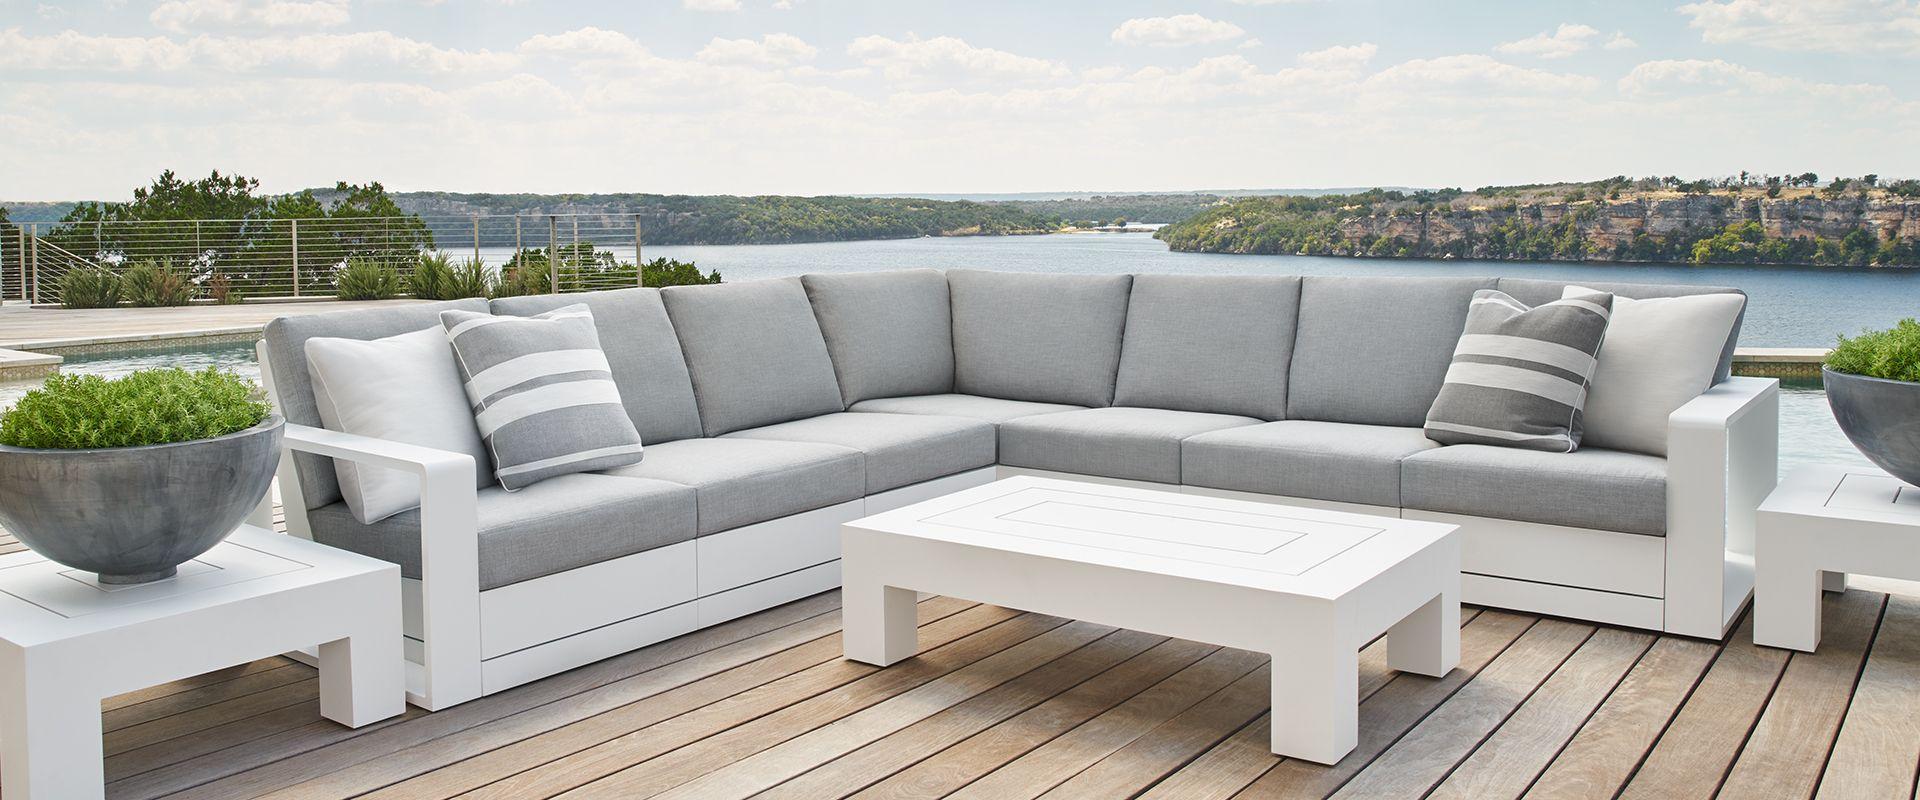 Sutherland Furniture Luxury Outdoor Furniture And Indoor Accessories Luxury Outdoor Furniture Replacement Cushions Outdoor Outdoor Furniture